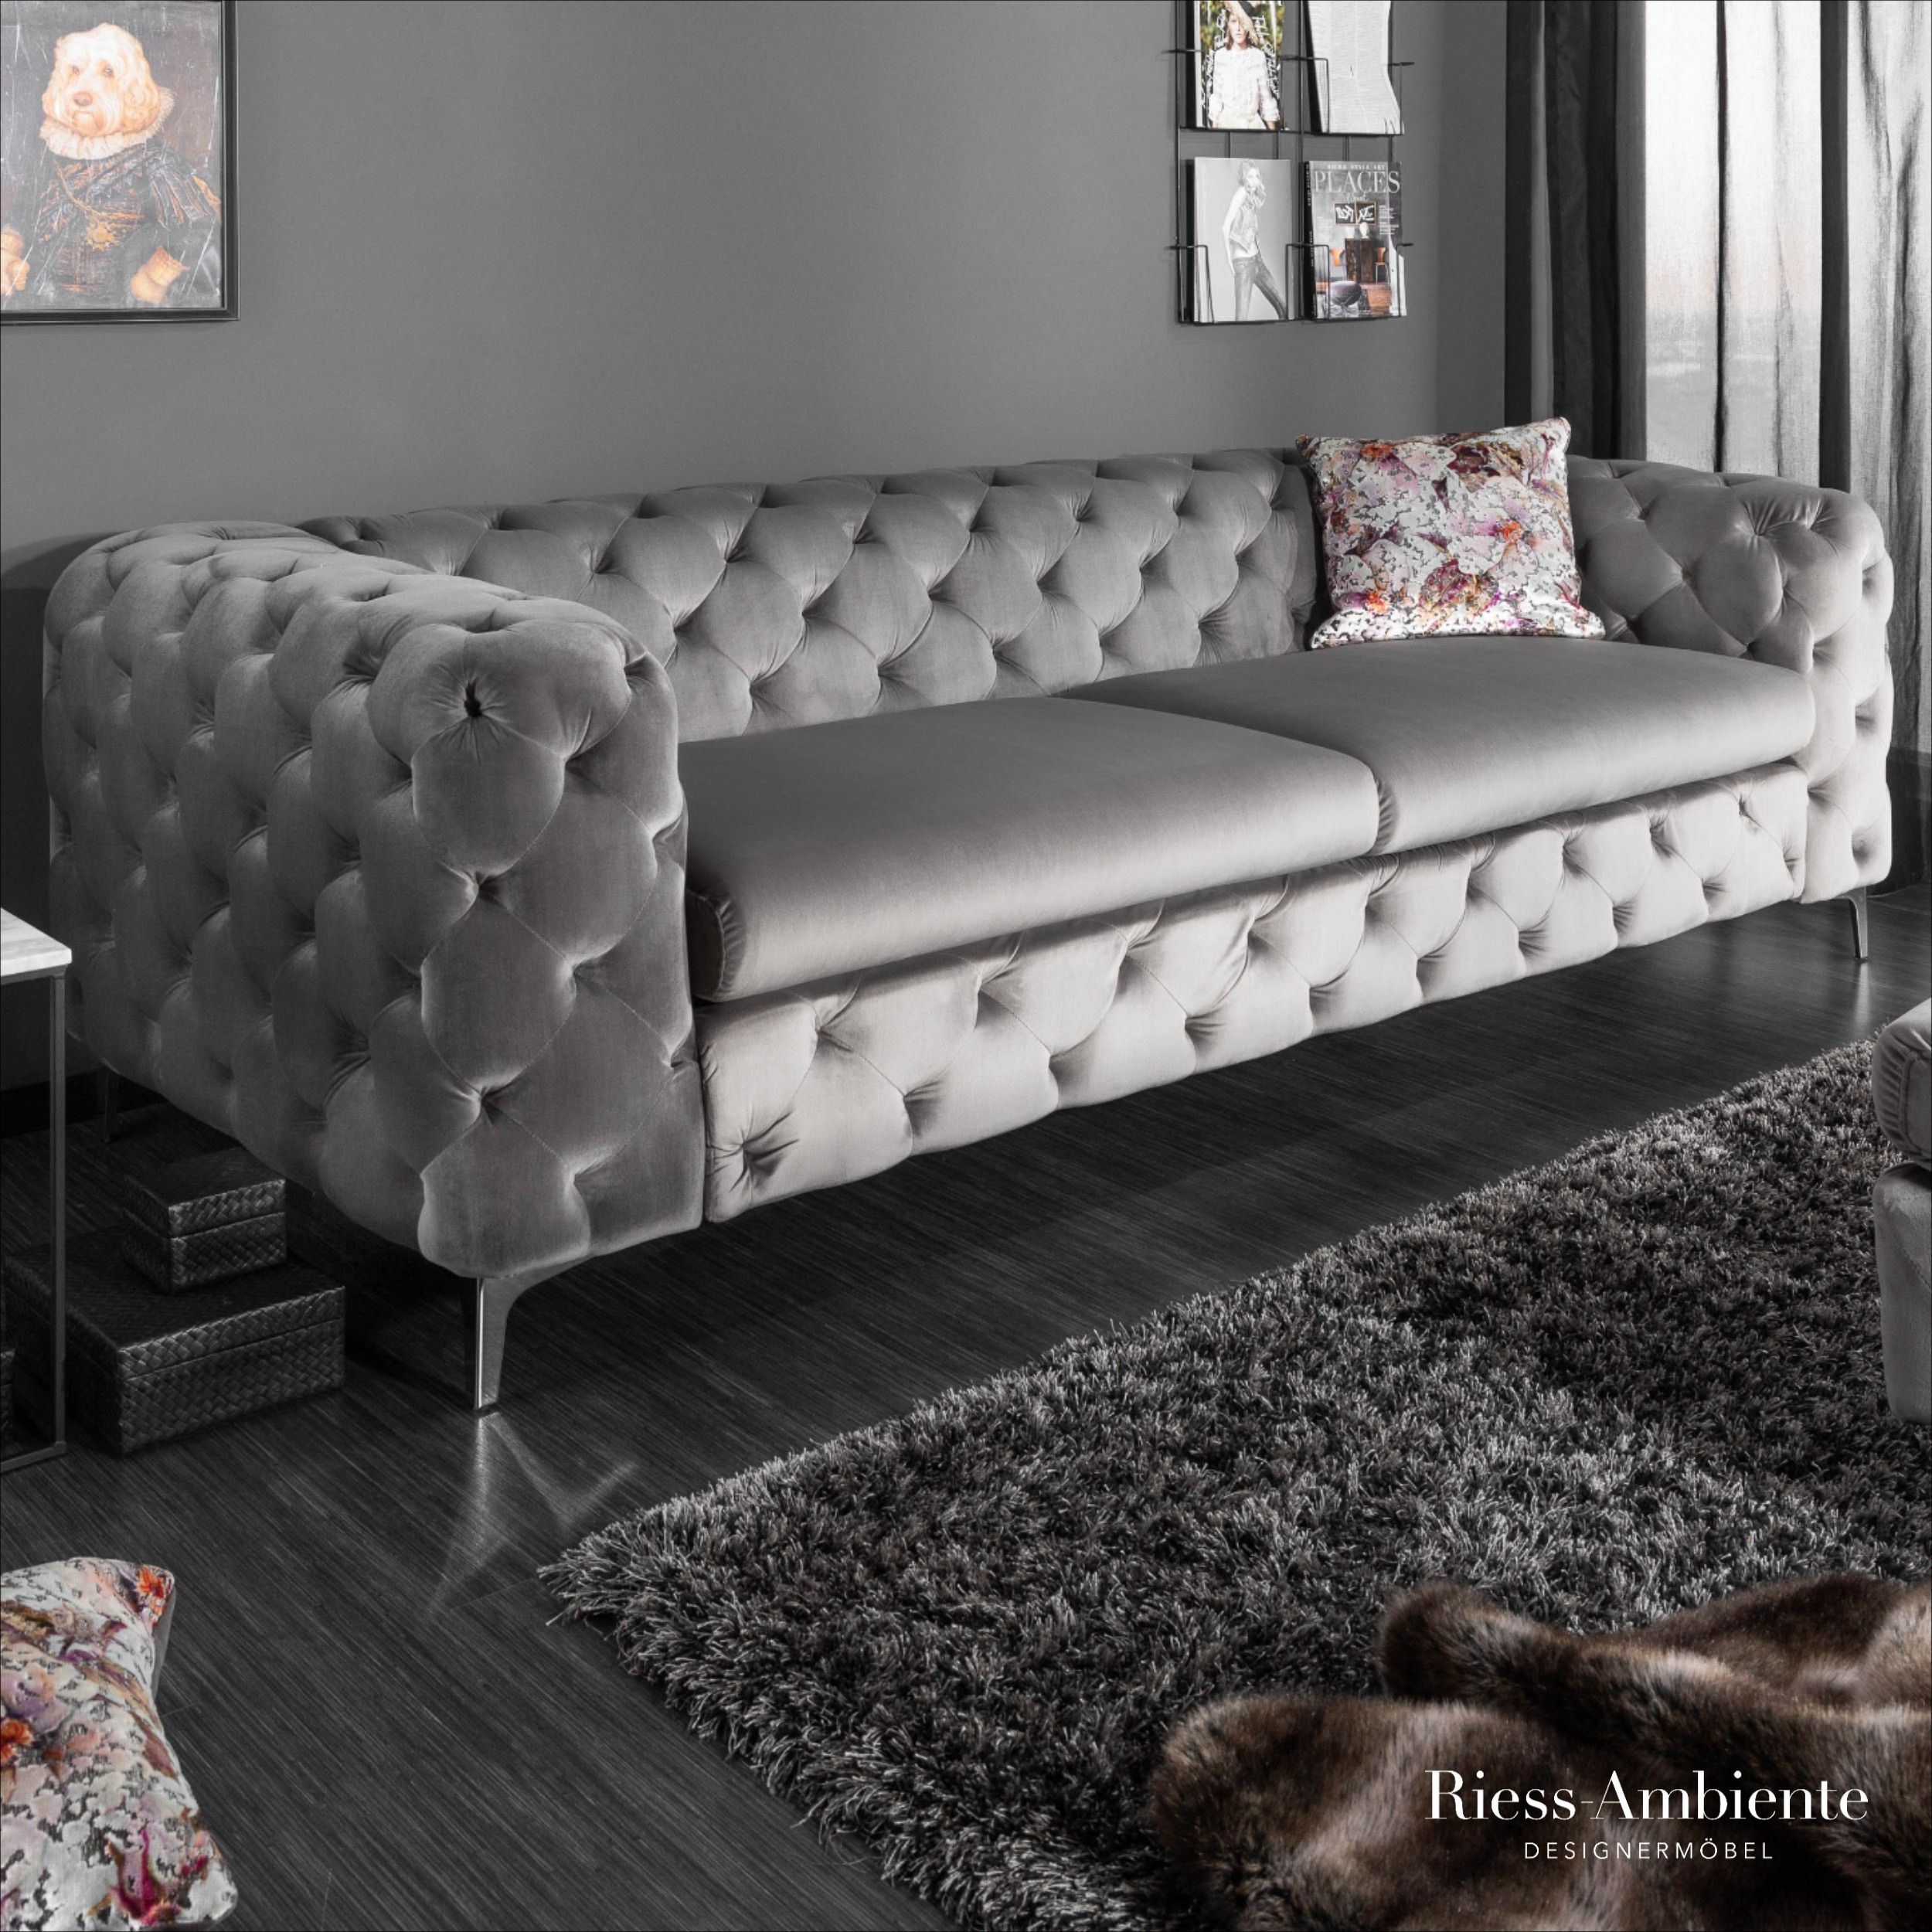 Chesterfield 3er Samt Sofa Grau Riess Ambiente De Chesterfield Wohnzimmer Samt Sofa Wohnzimmer Sofa